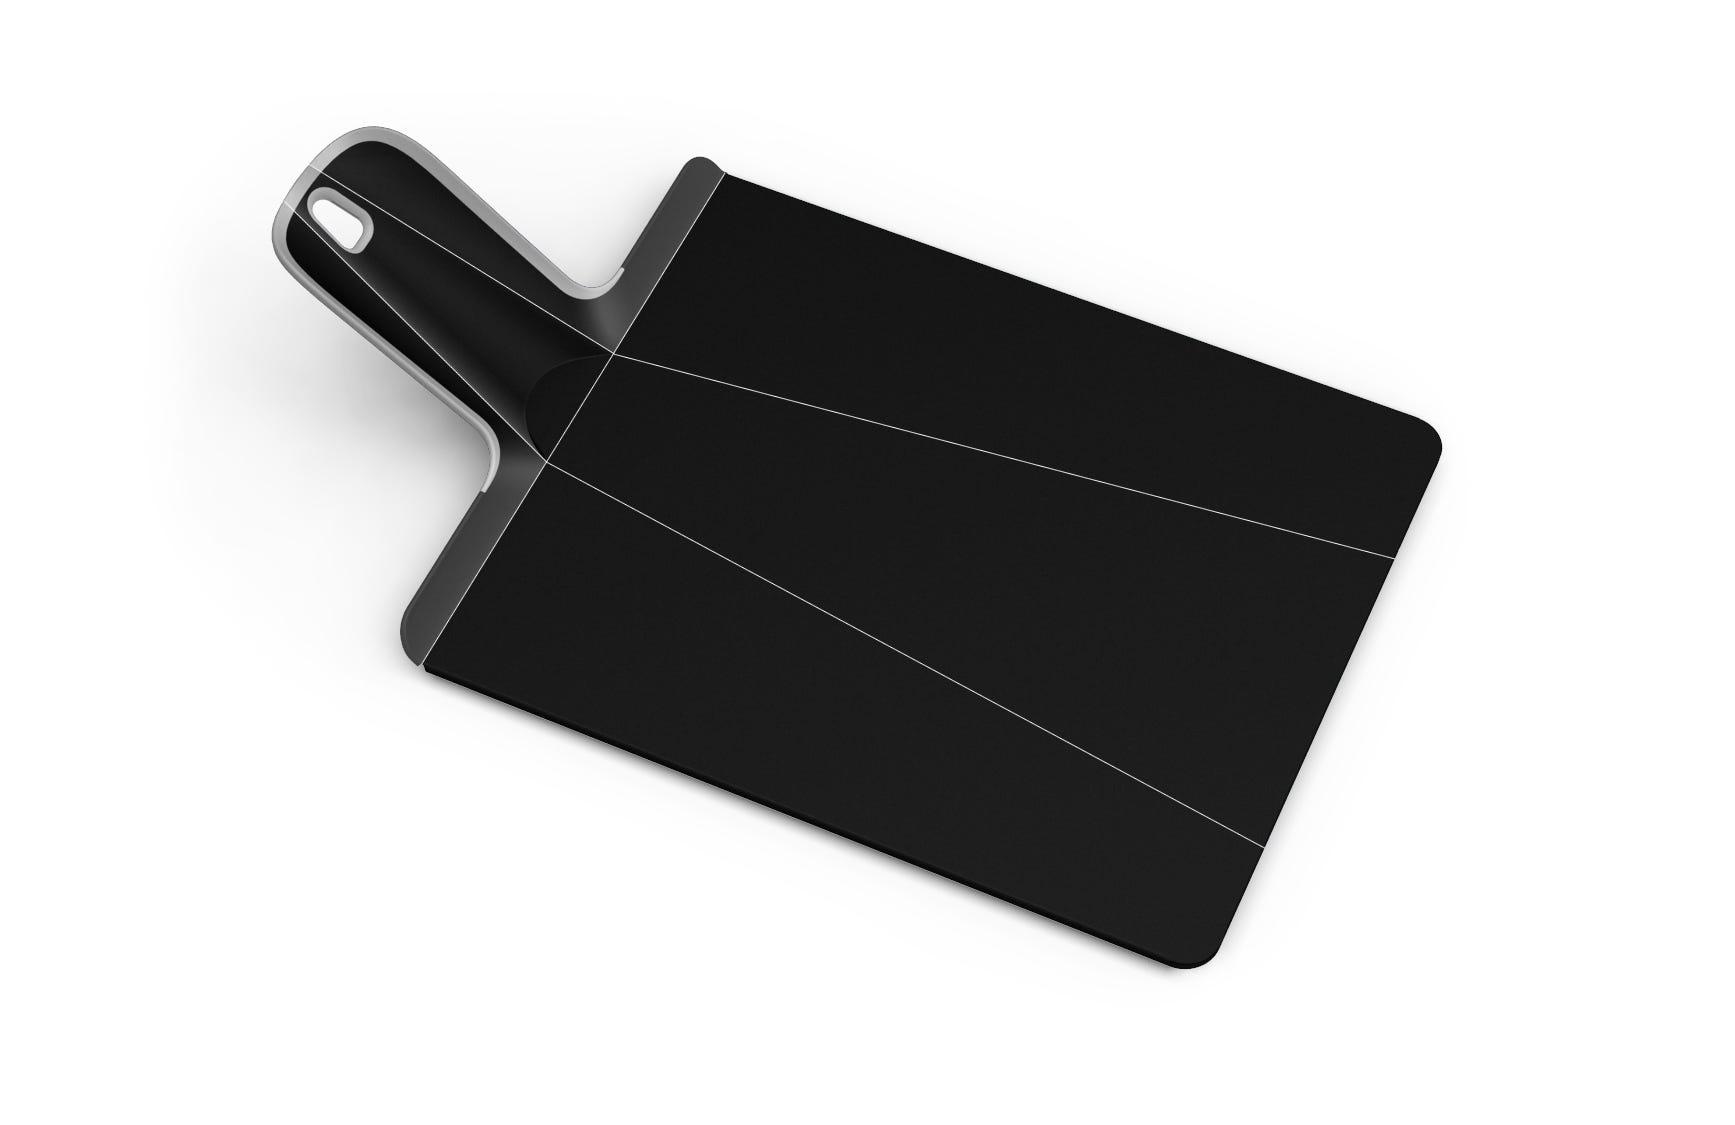 Tabla amplia y plegable para picar Joseph Joseph® Chop2Pot™, en negro